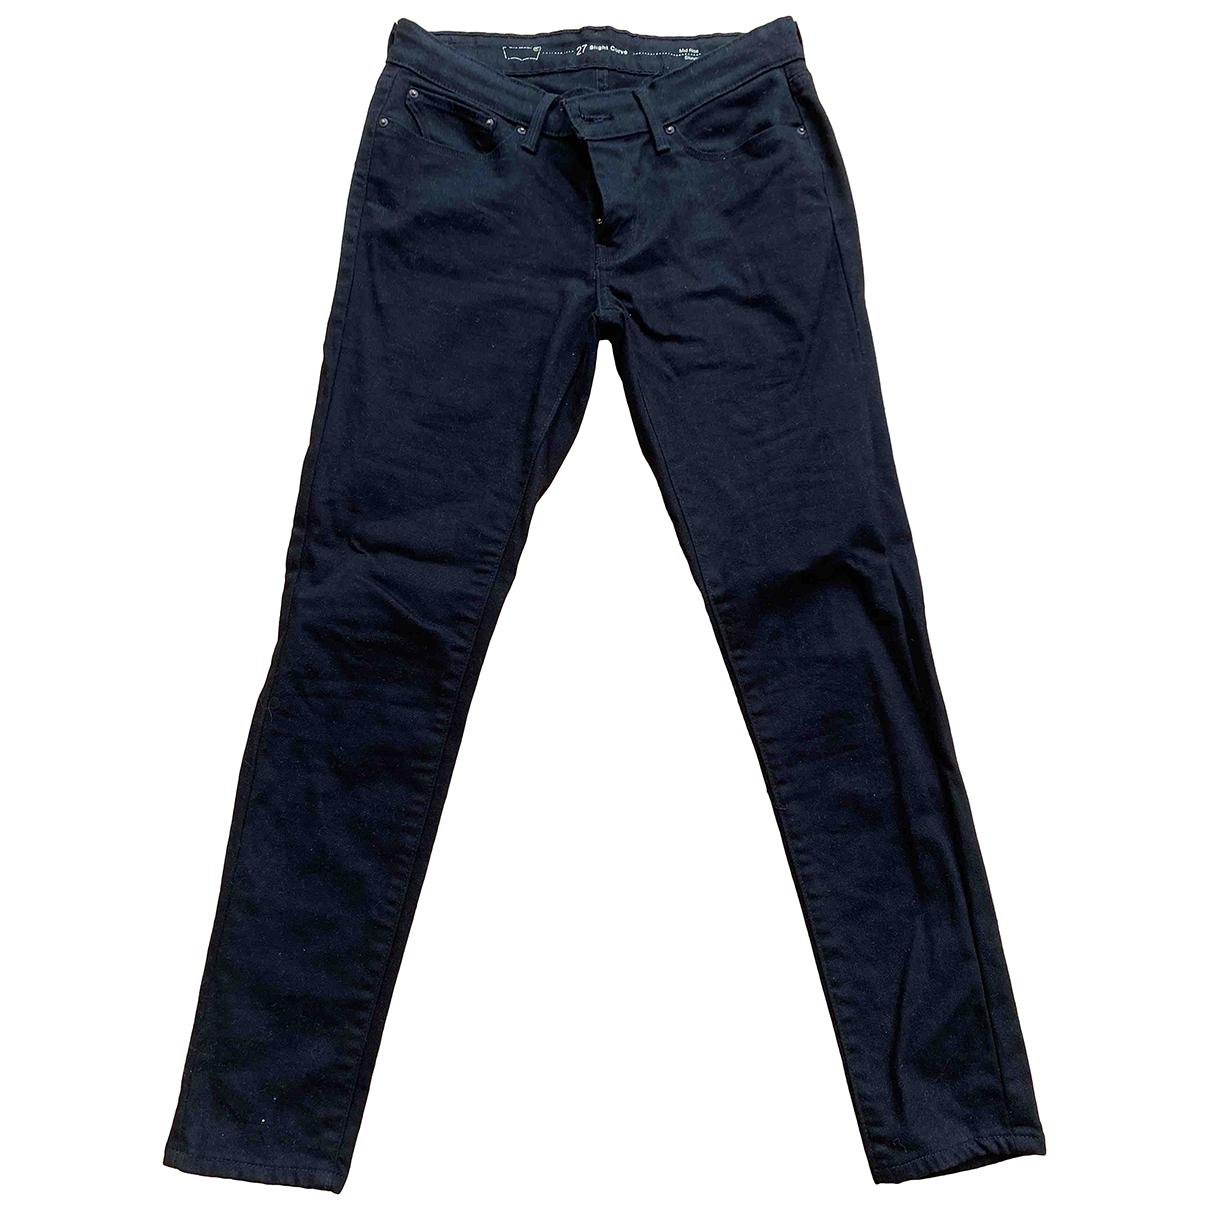 Levi's \N Black Denim - Jeans Jeans for Women 36 FR